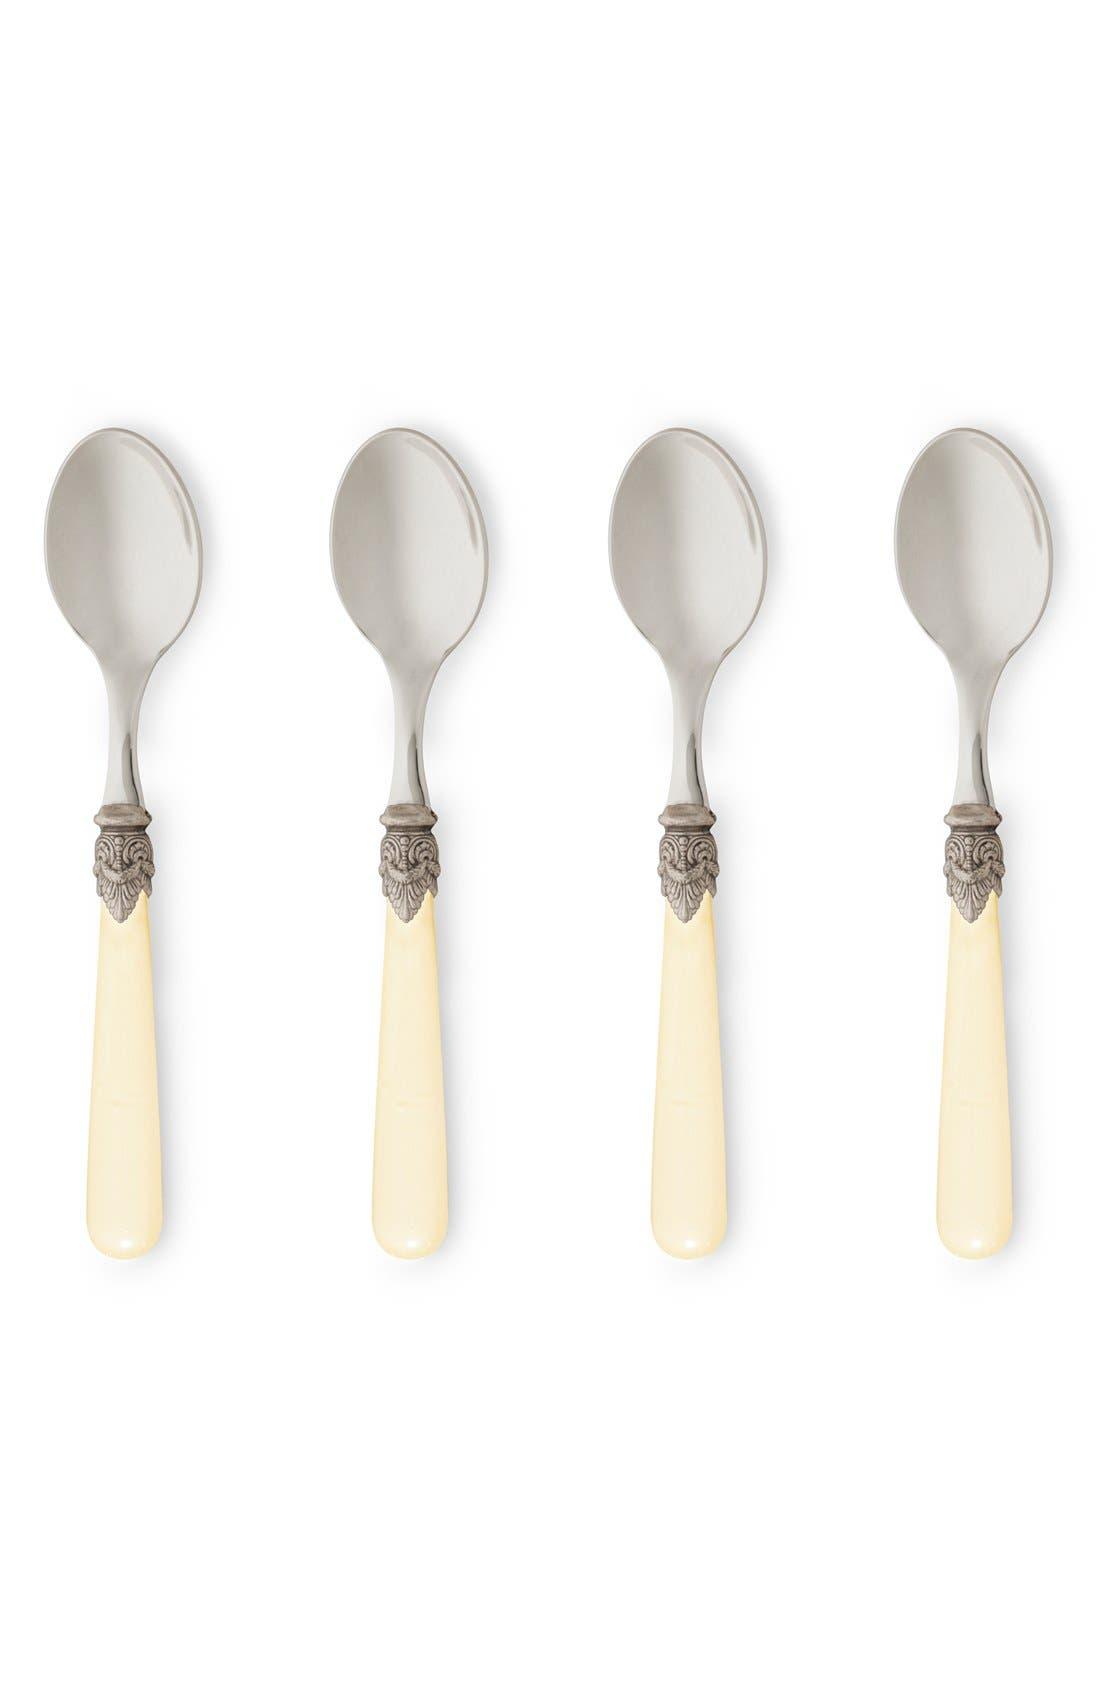 Rosanna 'Napoleon' Espresso Spoons (Set of 4)